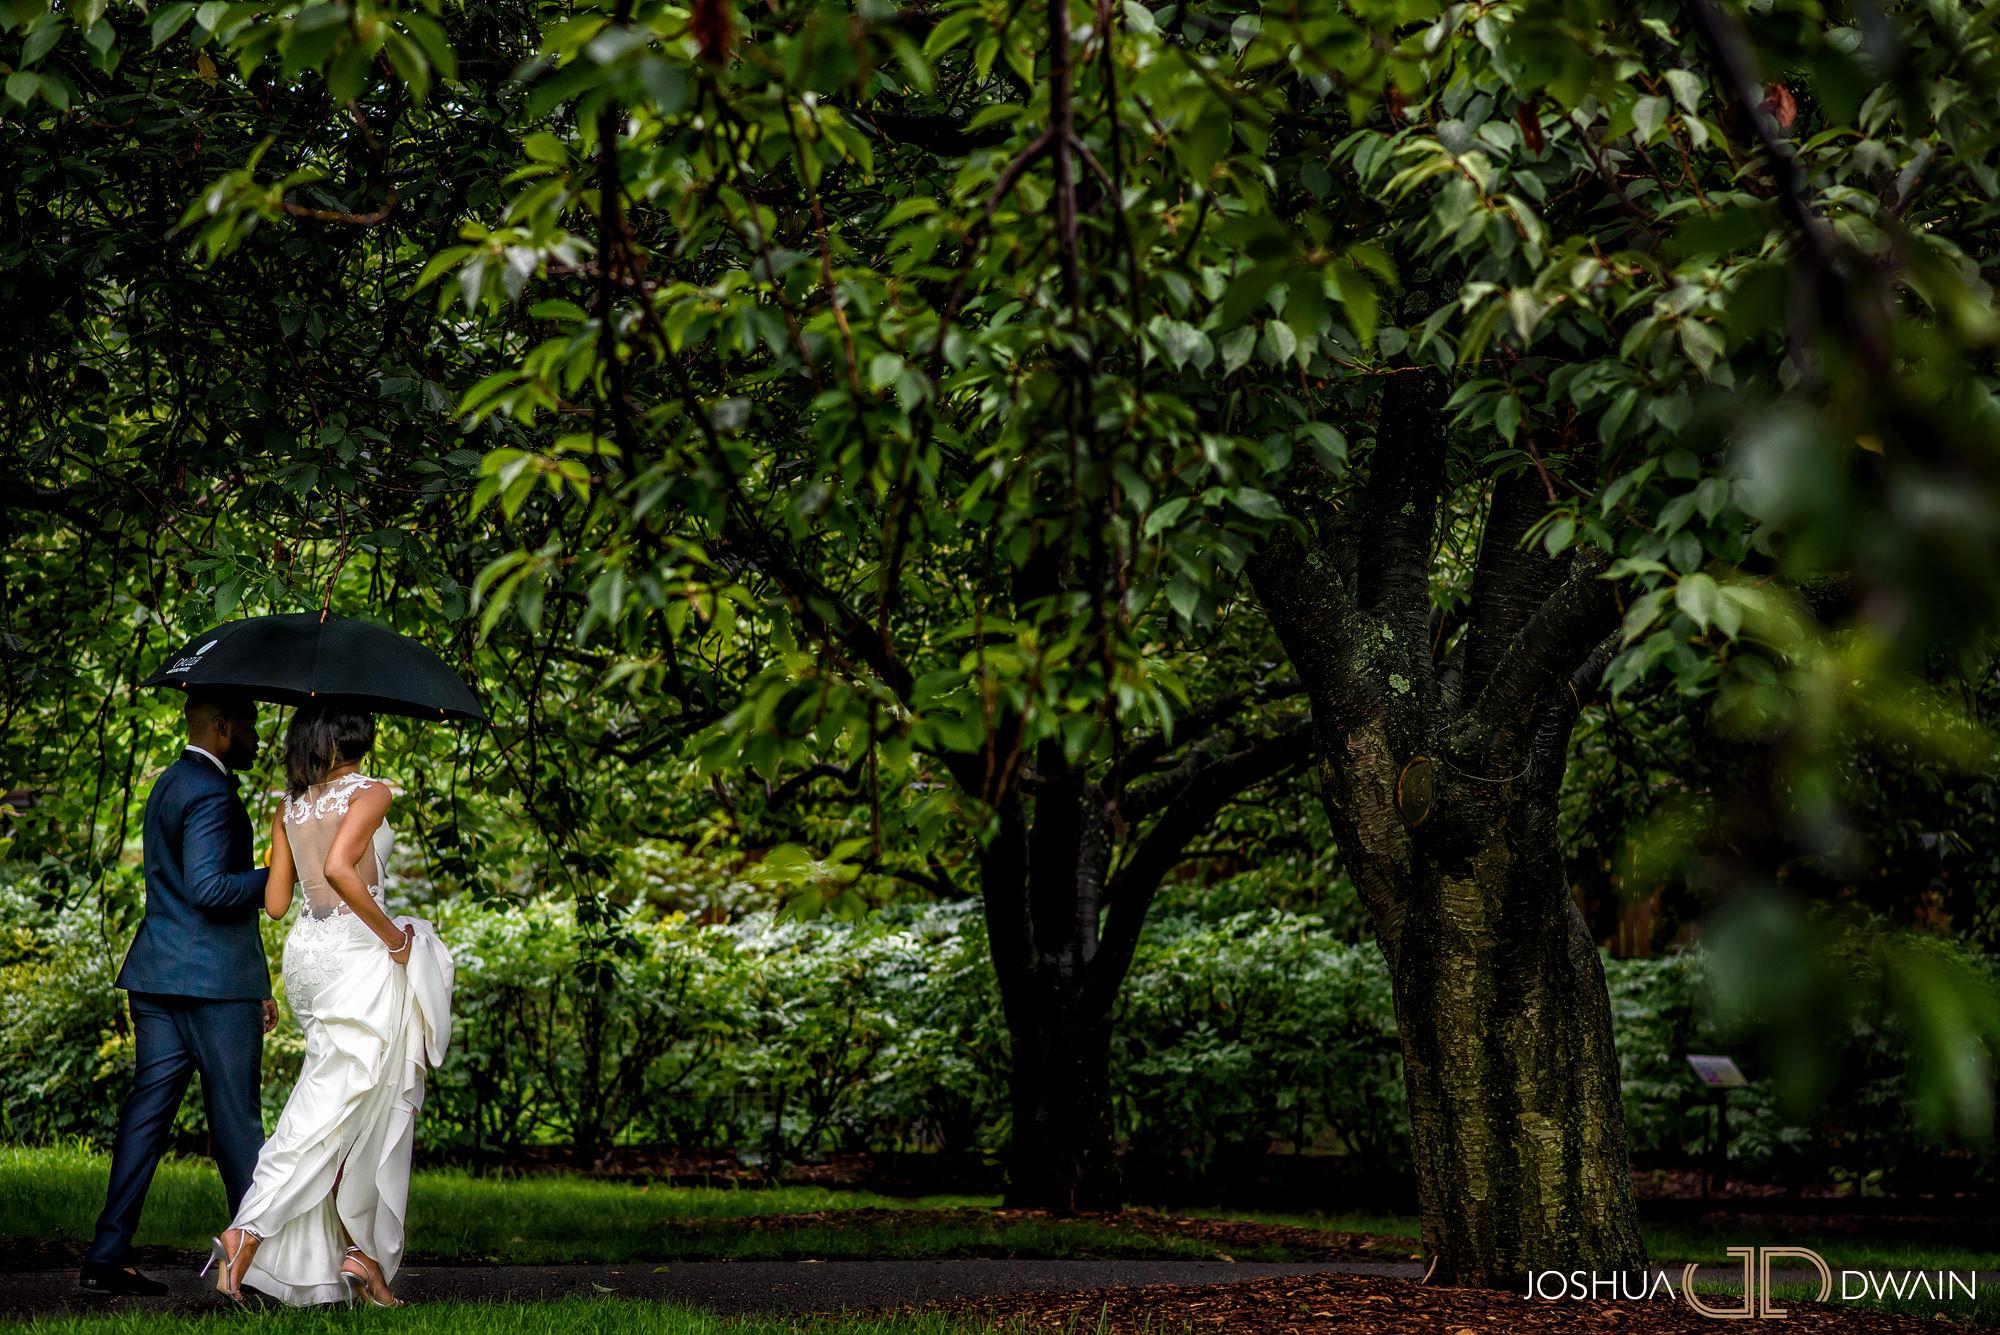 joshua-dwain-weddings-gallery-best-wedding-photographers-us-051